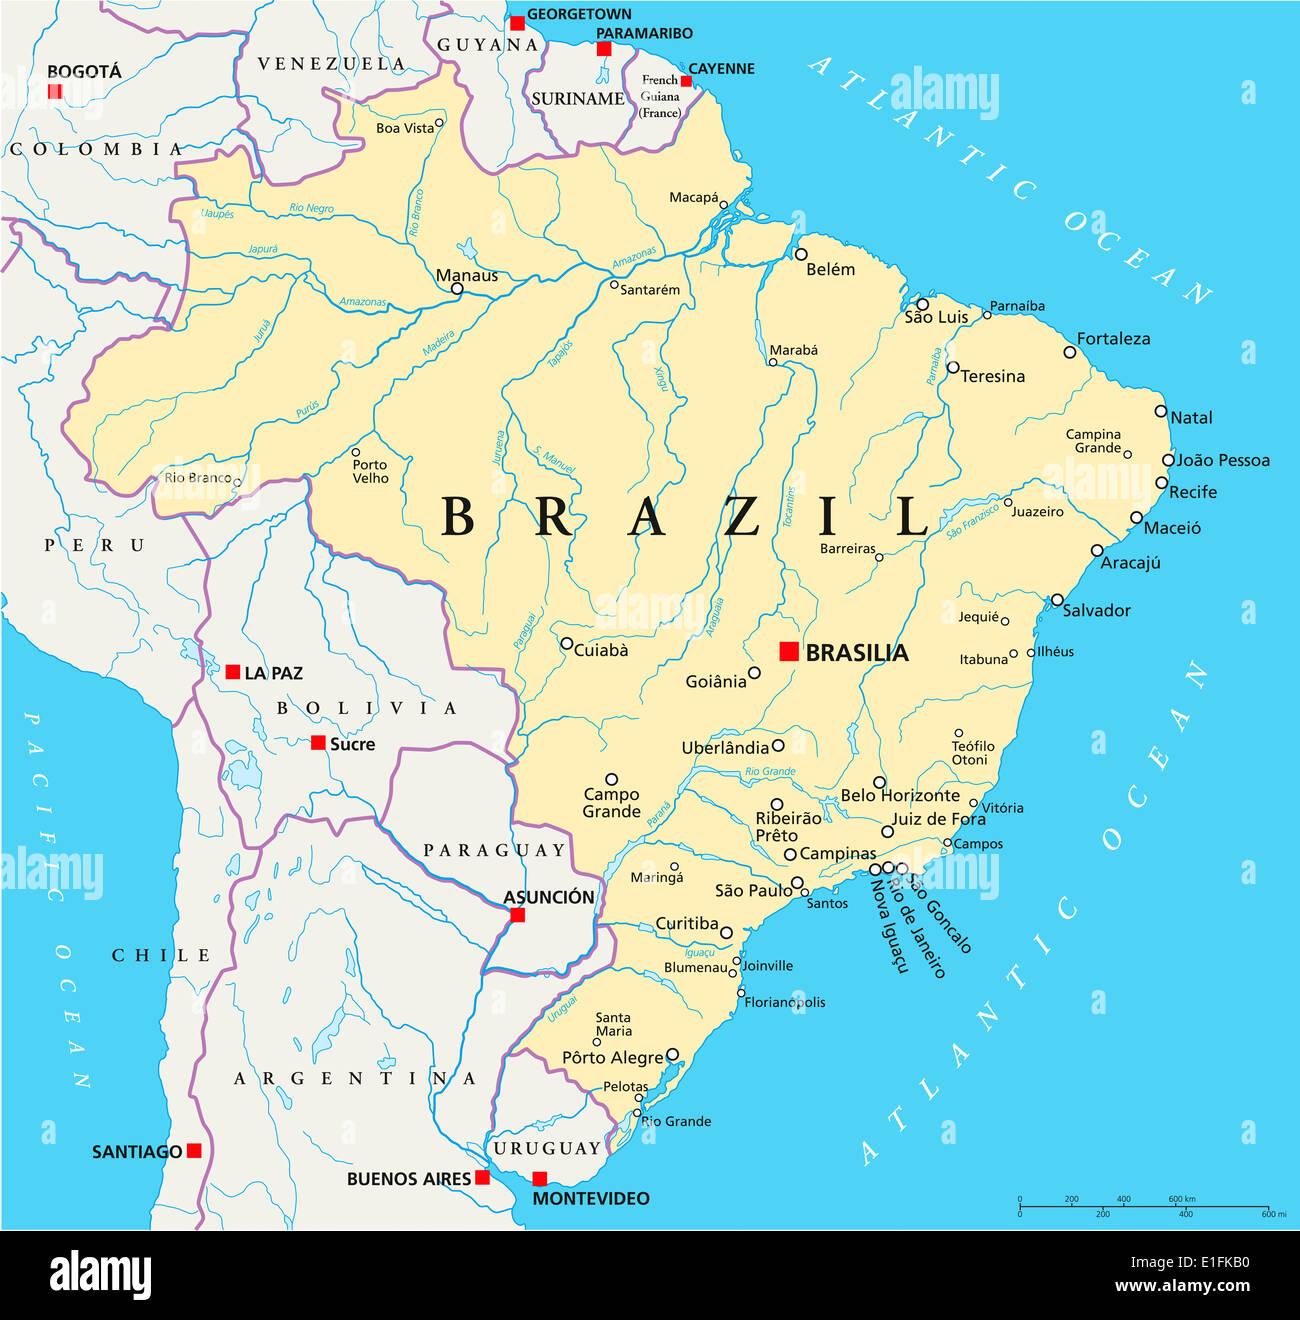 Brasilien Landkarte Mit Hauptstadt Brasilia Landesgrenzen